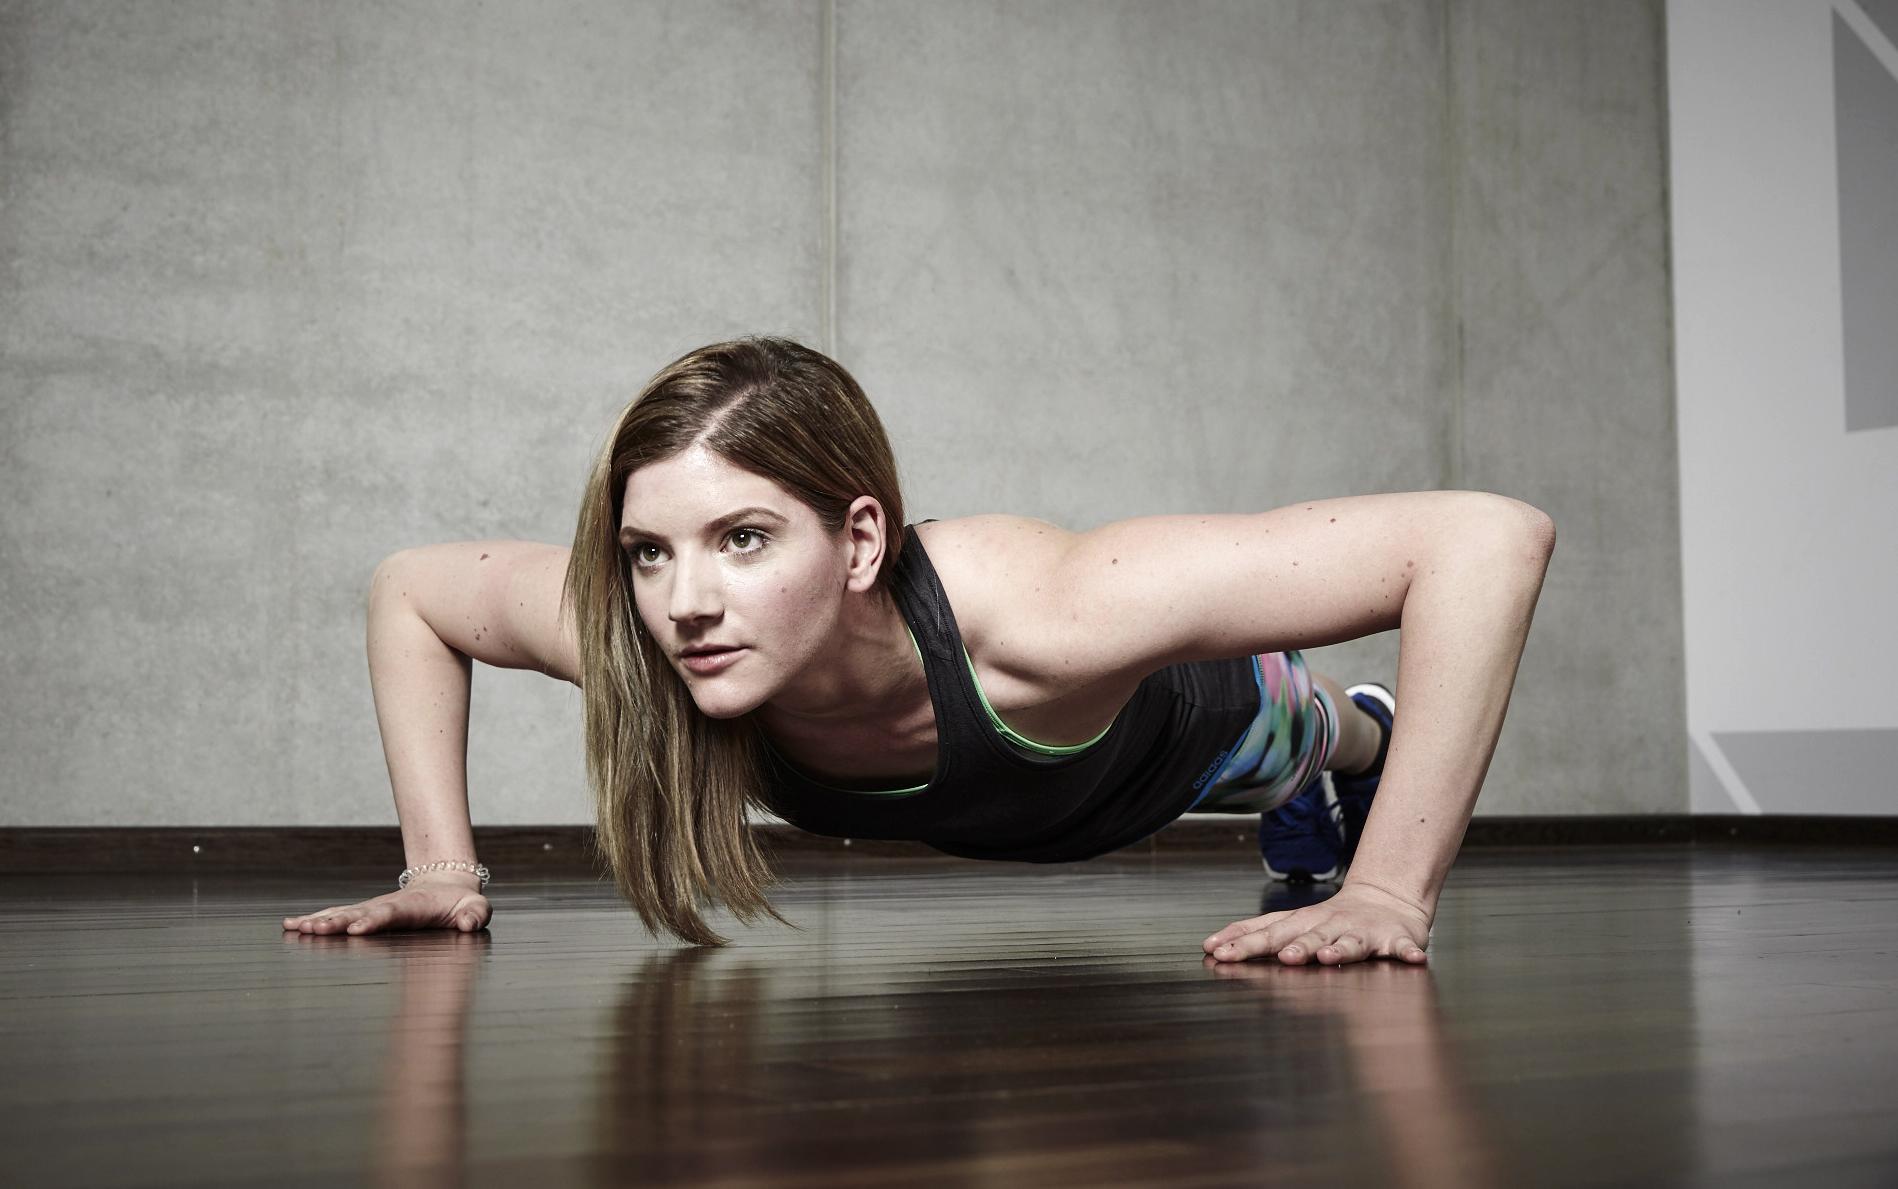 bea-la-panthere-fitnessblogger-lifestyleblogger-muenchen-munich-deutschland-germany-adidas-PR-Shooting-Blogger-274